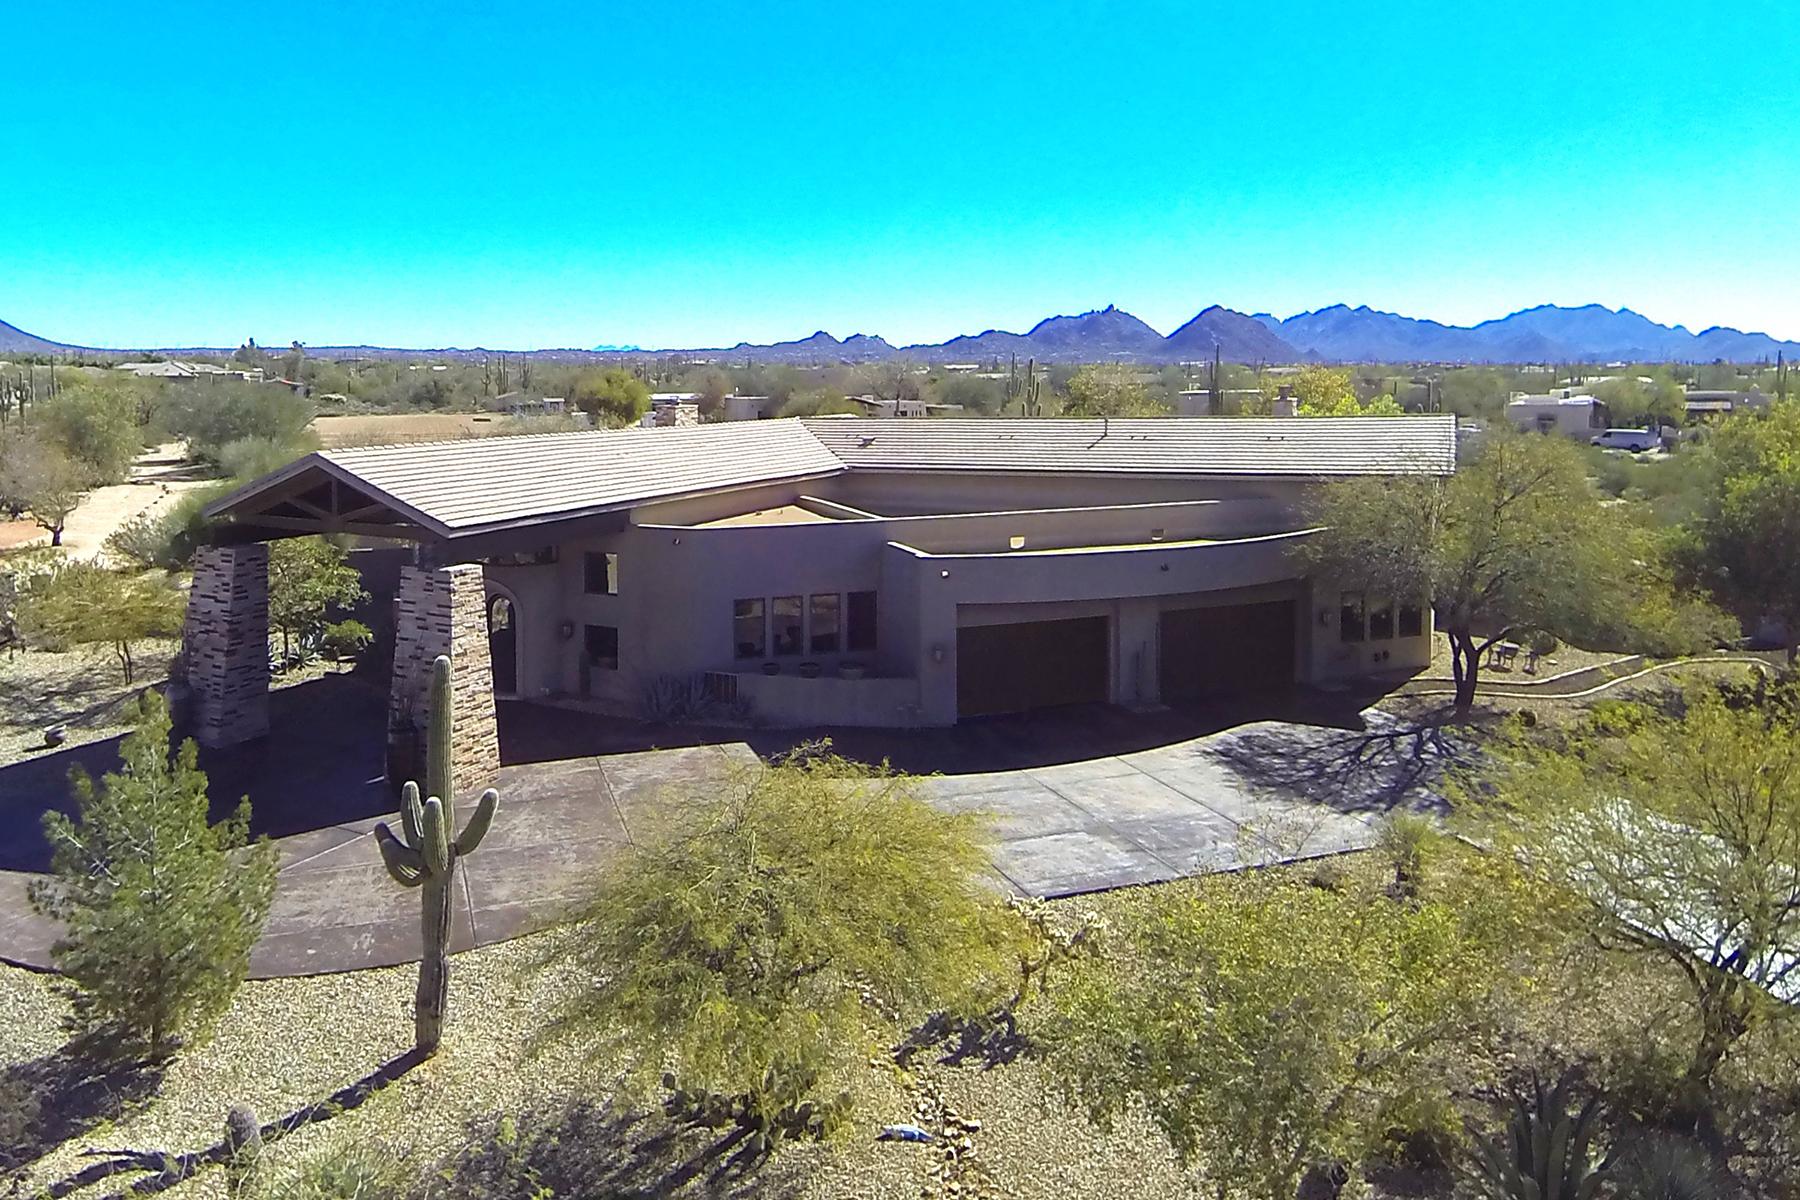 独户住宅 为 销售 在 Magnificent custom home on 2.3 acres 29501 N 76Th Street 斯科茨代尔, 亚利桑那州, 85266 美国